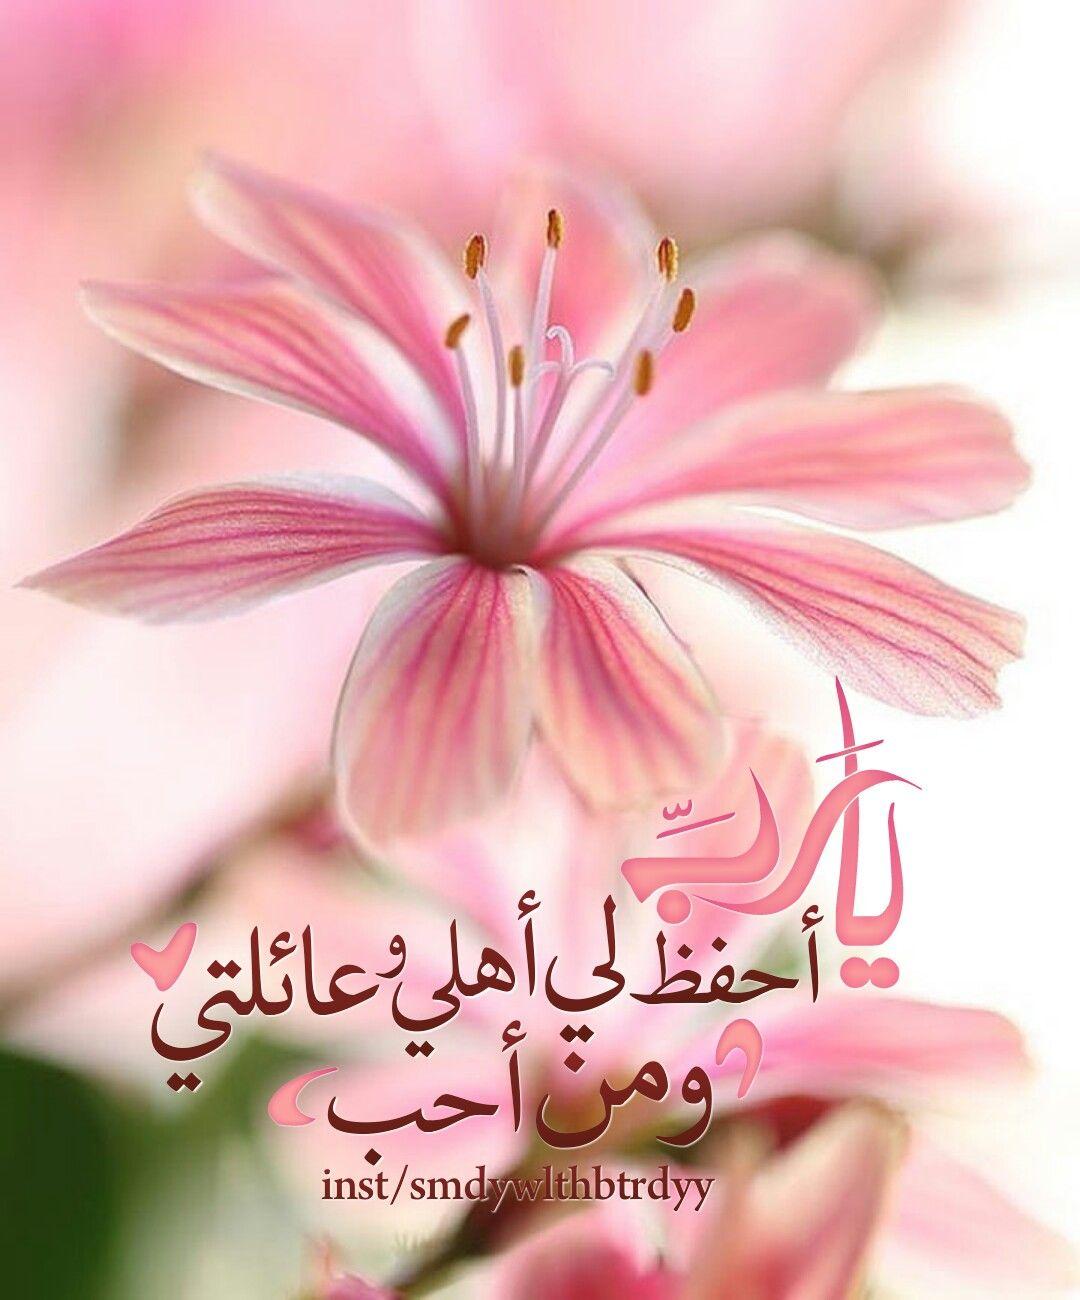 يا رب أحفظ لي عائلتي وأهلي ومن أحب Learn Arabic Alphabet Arabic Alphabet Arabic Quotes